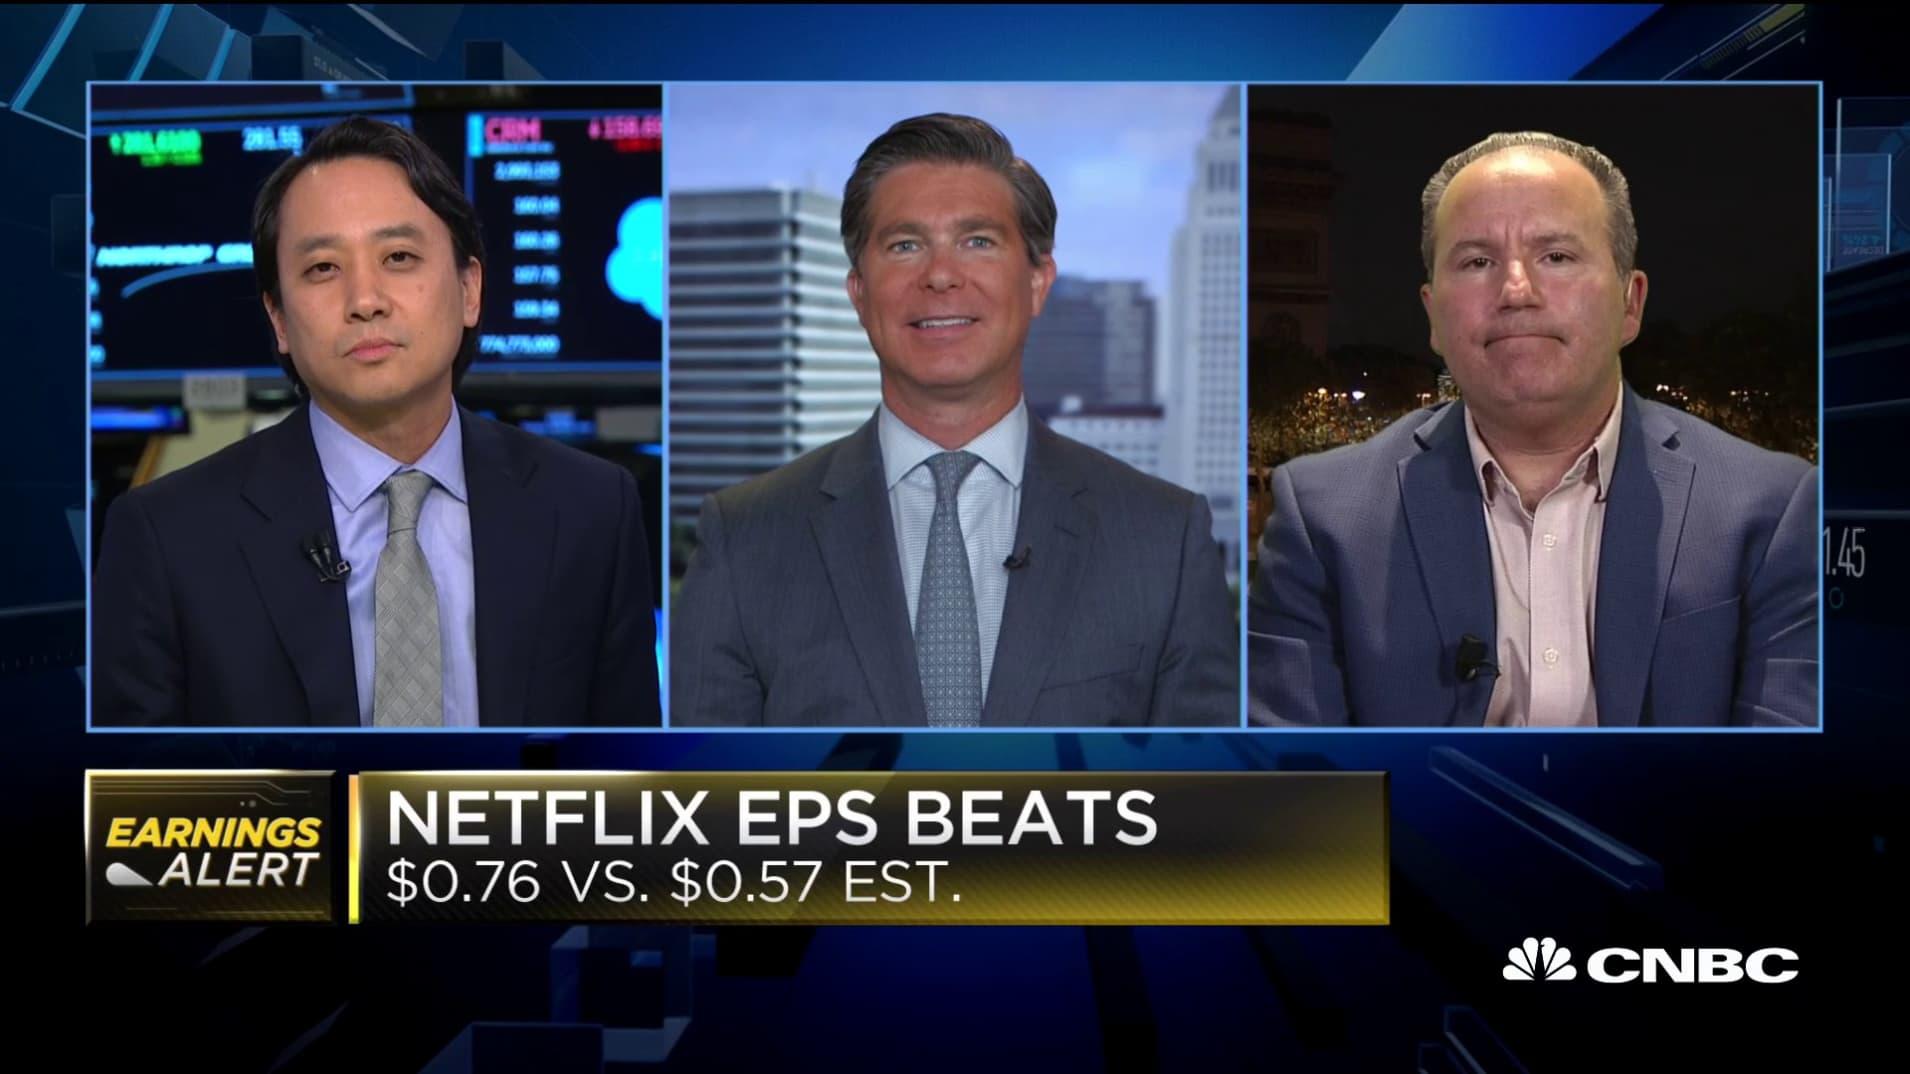 Netflix's low guidance a strategic move, says Ross Gerber